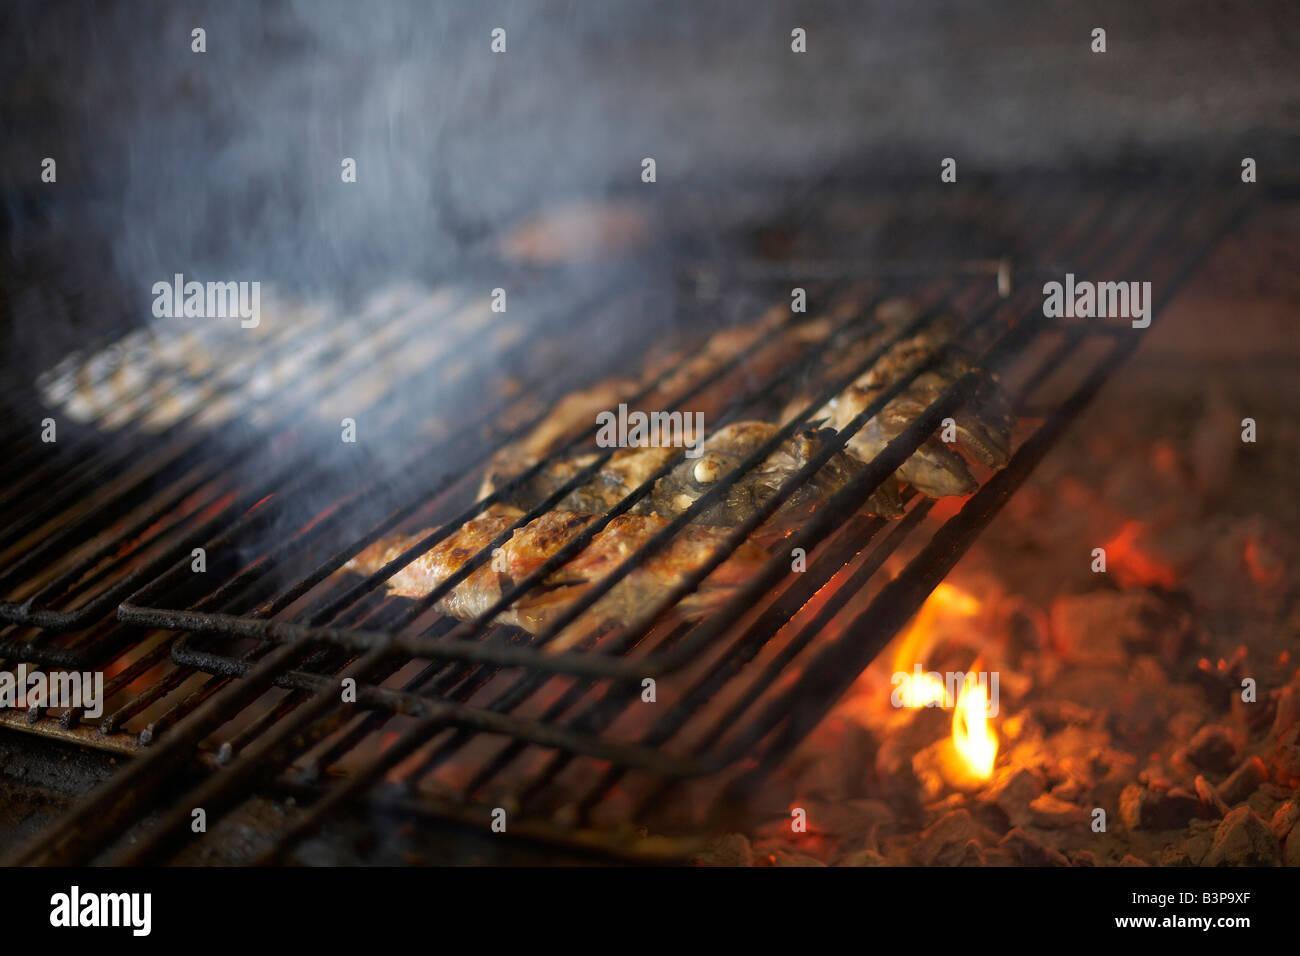 Gas Oder Holzkohlegrill Yorkshire : Grill property stockfotos & grill property bilder alamy